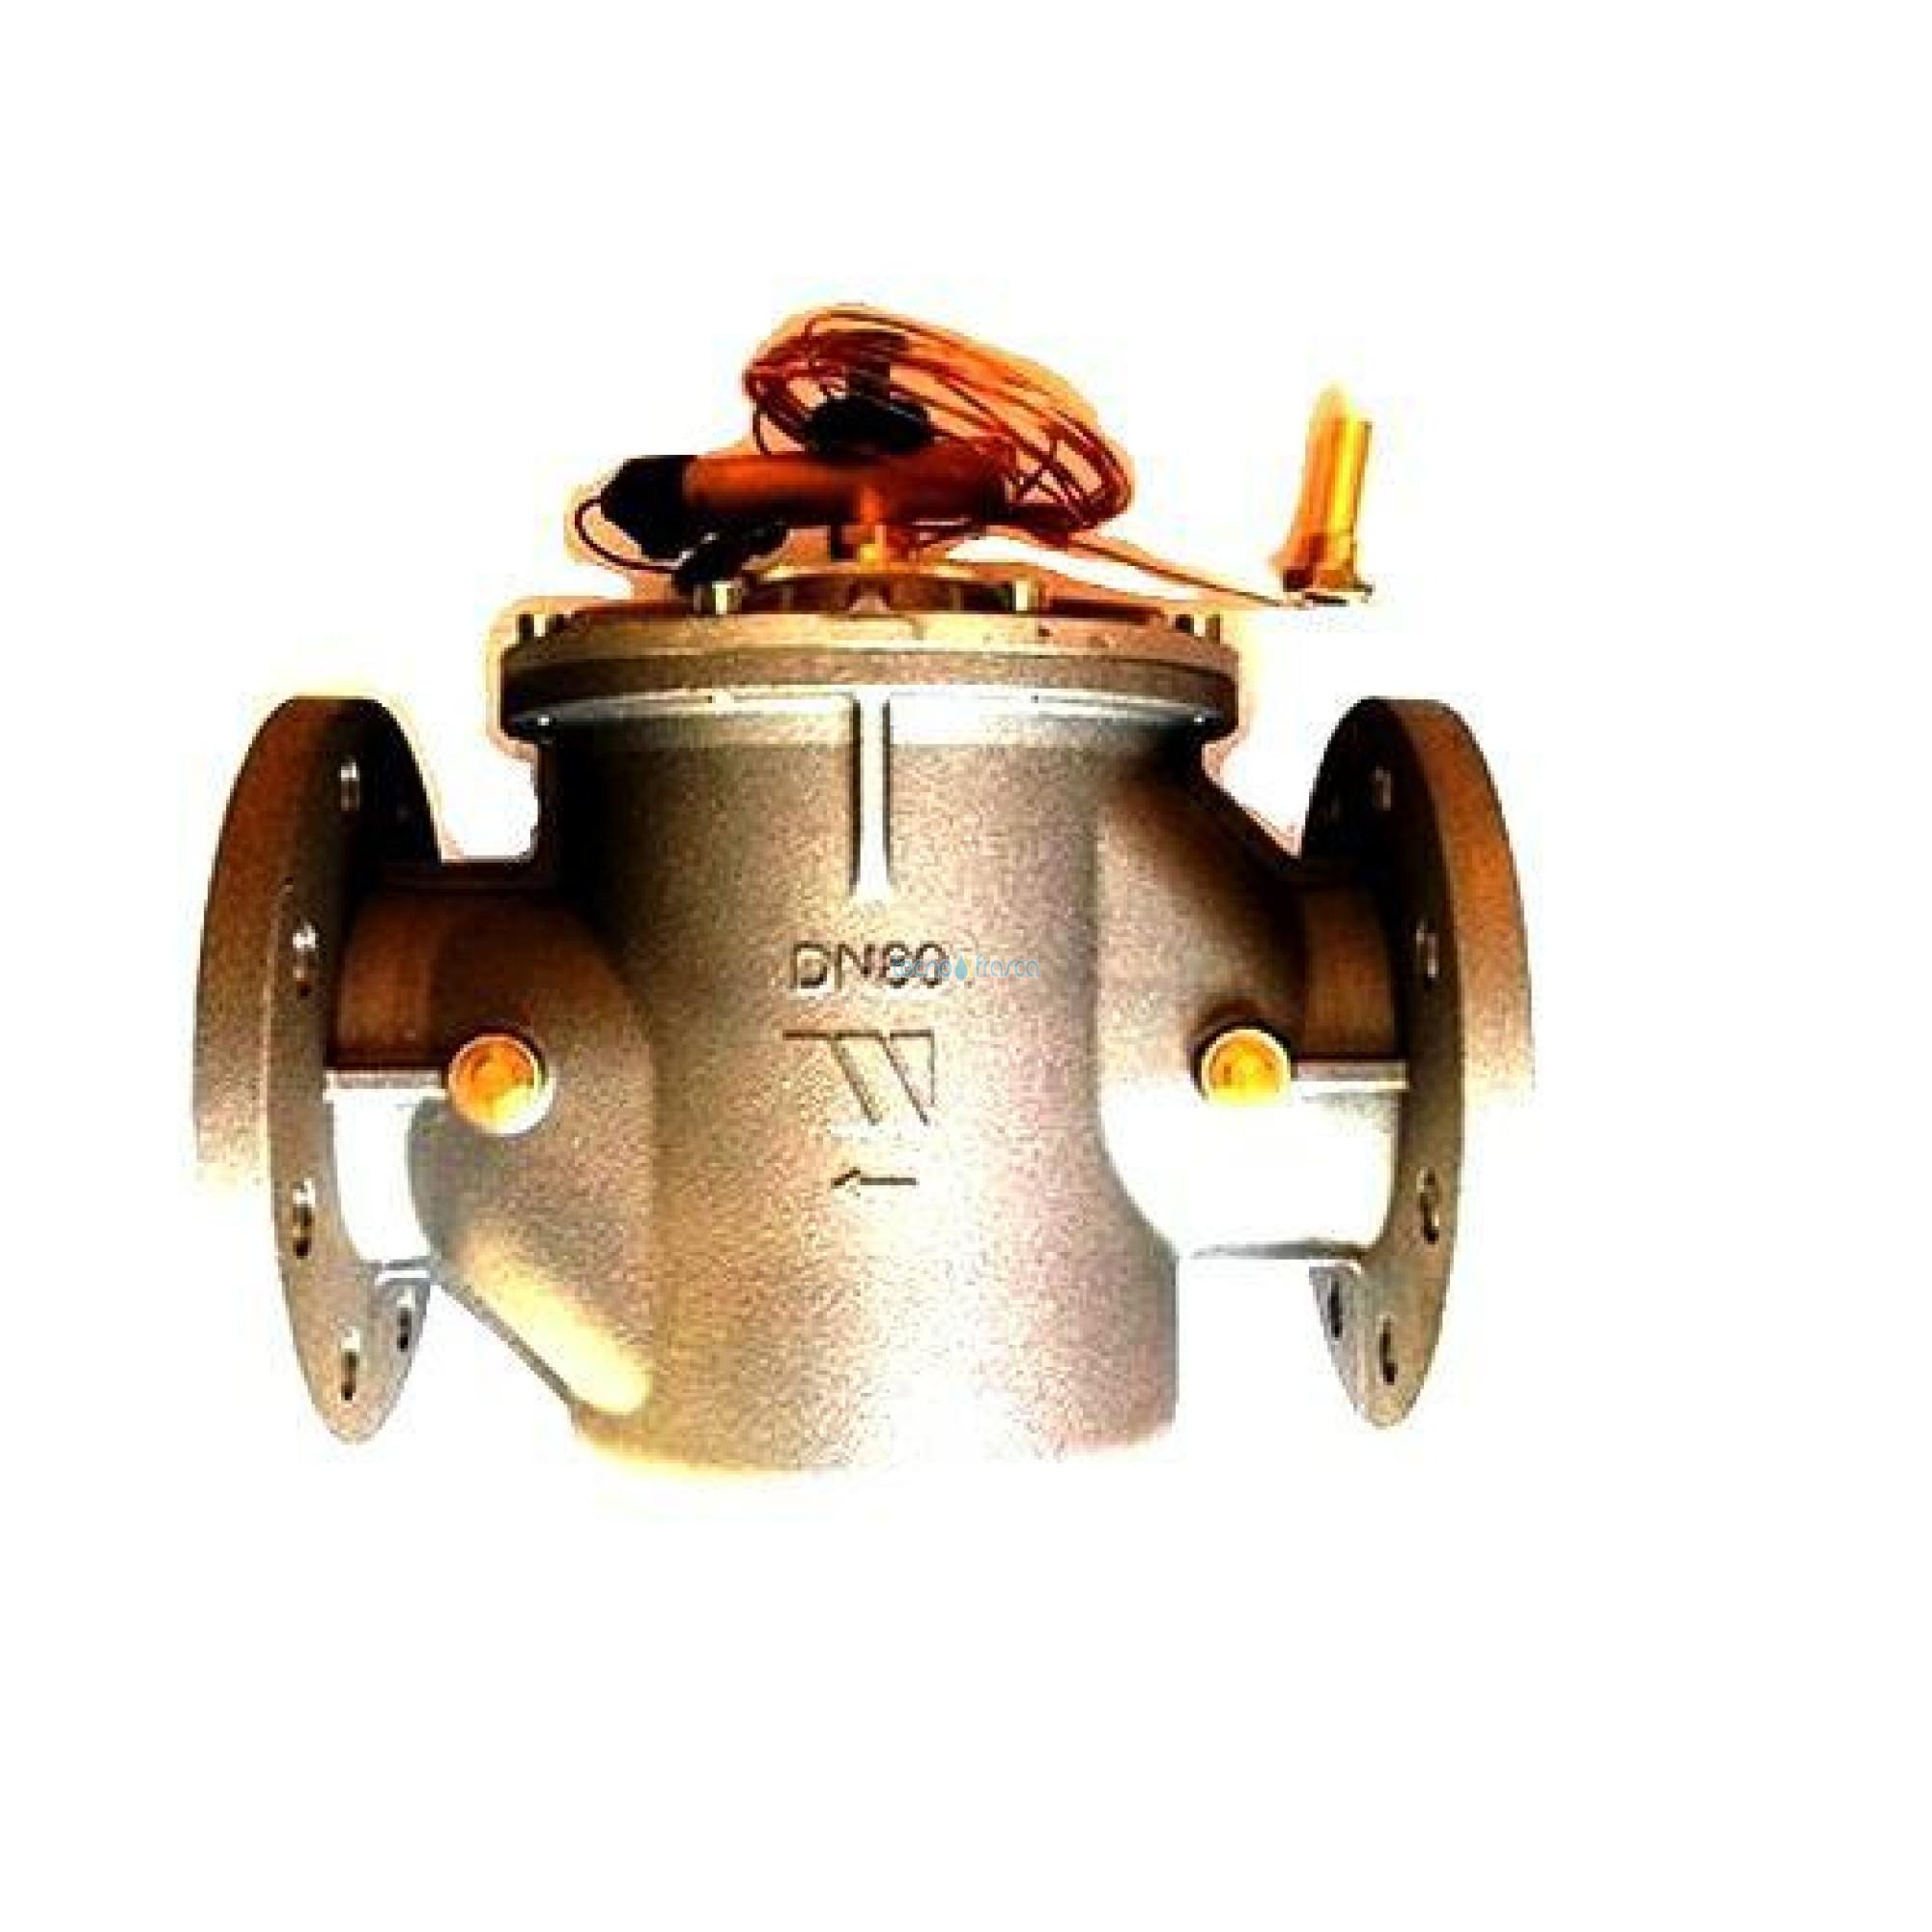 Valvola intercettazione dn80 nvf watts 0231480